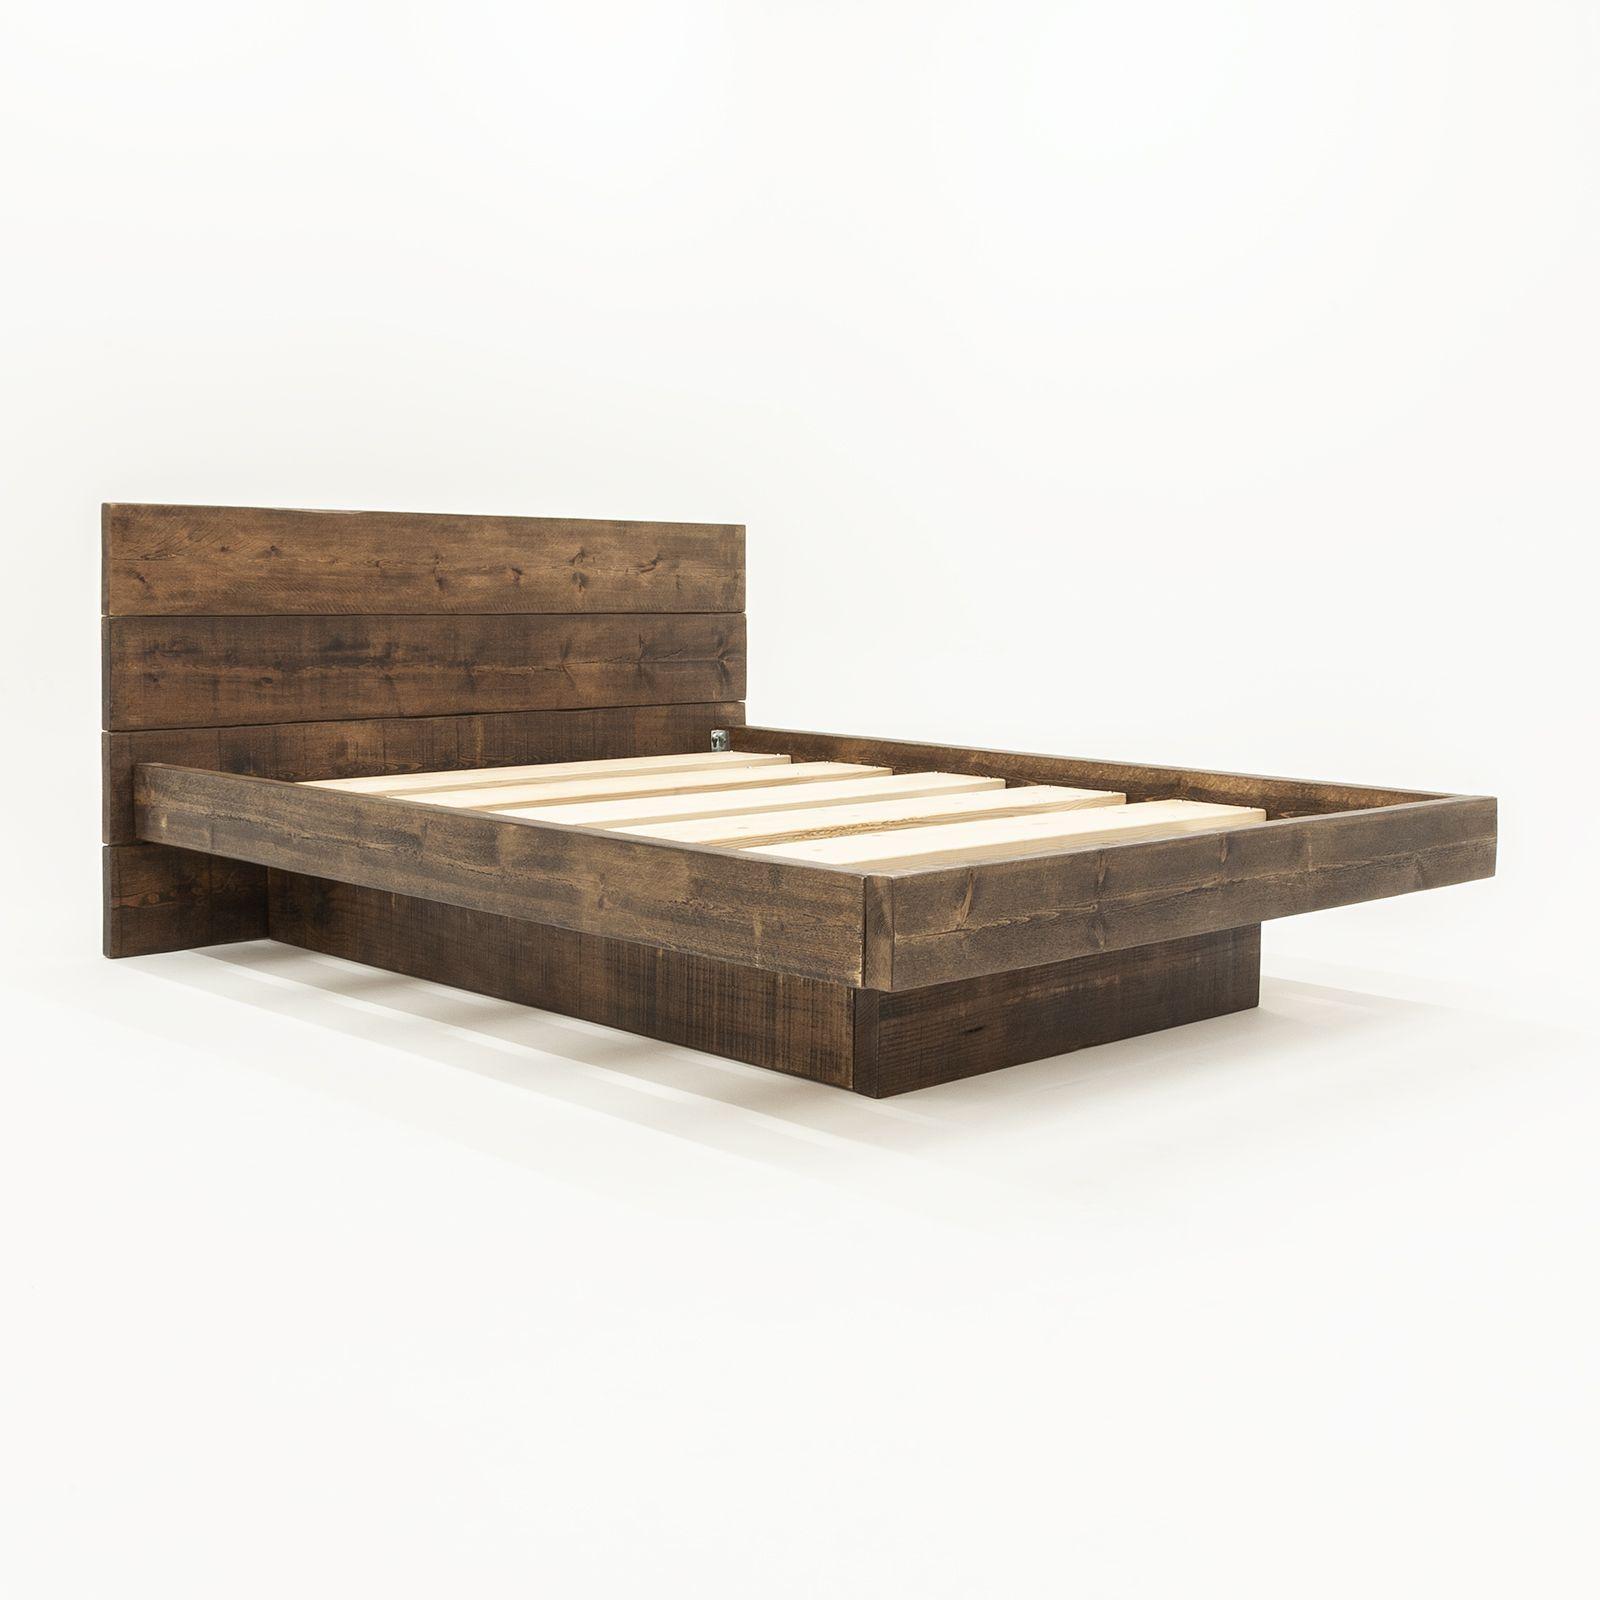 Pin By Emily Sanders On Furniture Floating Bed Frame Rustic Bed Frame Bed Frame Plans